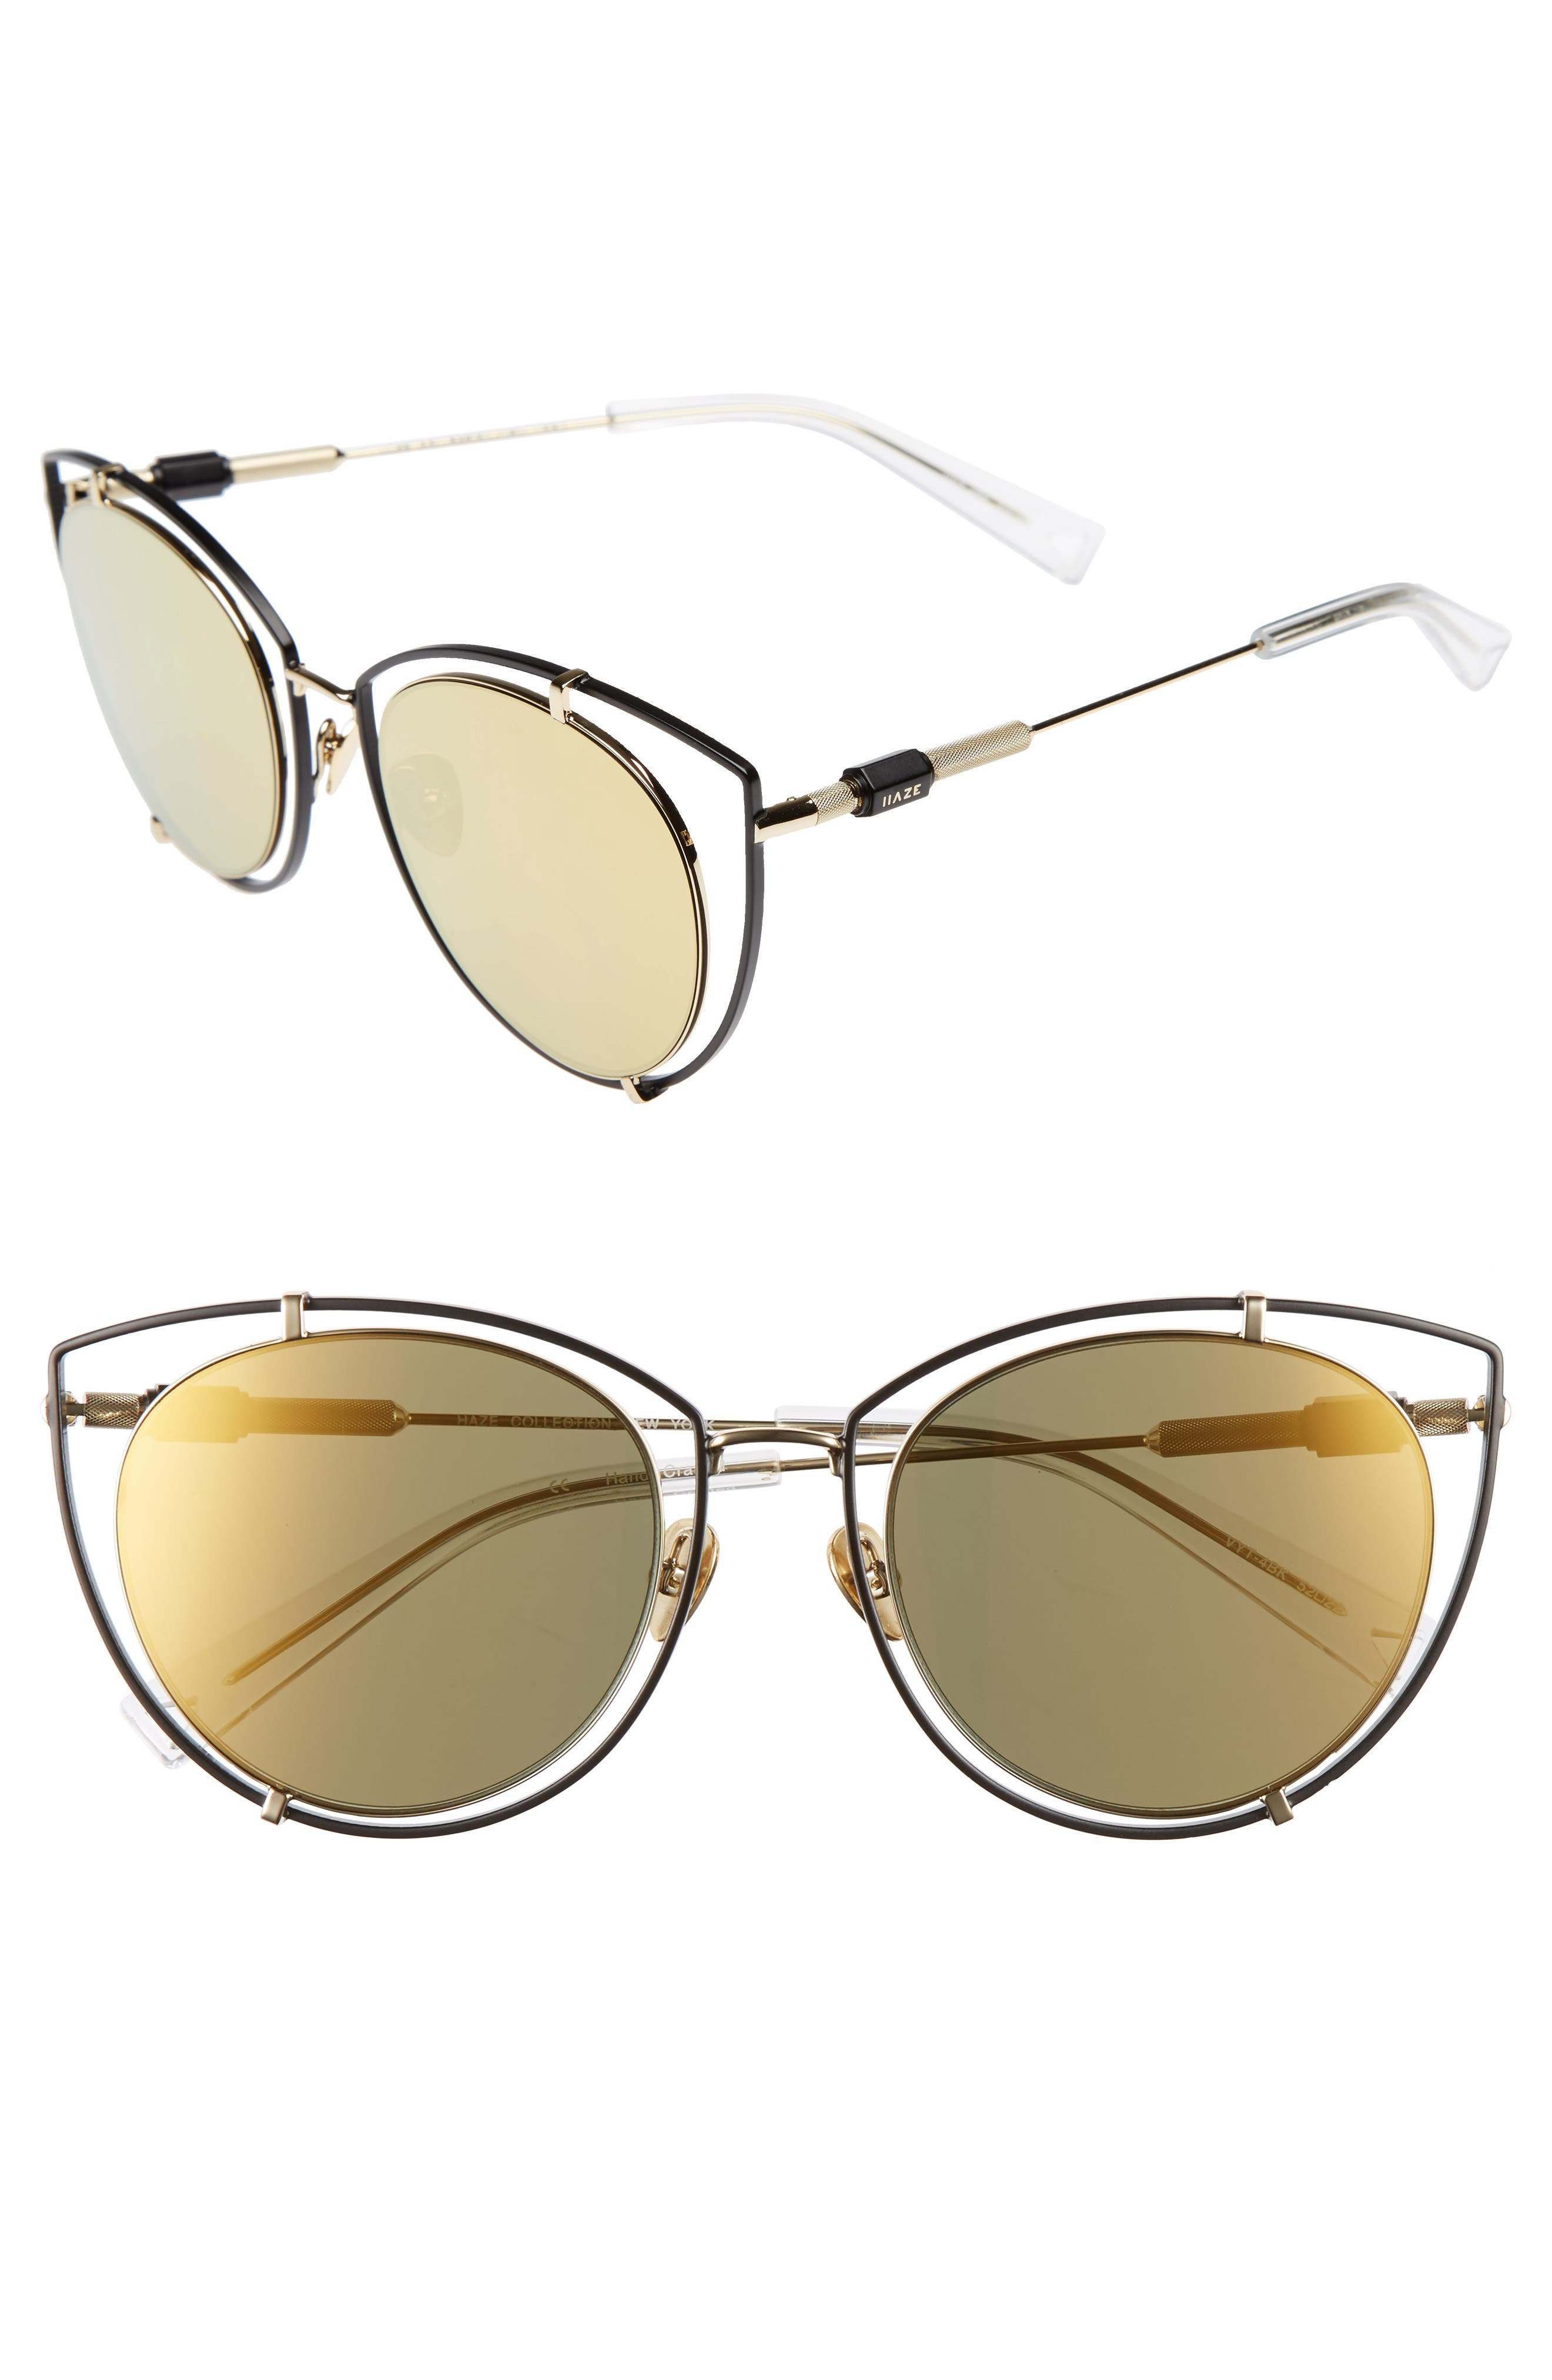 Vyt 53mm Cat Eye Sunglasses,                         Main,                         color, 001